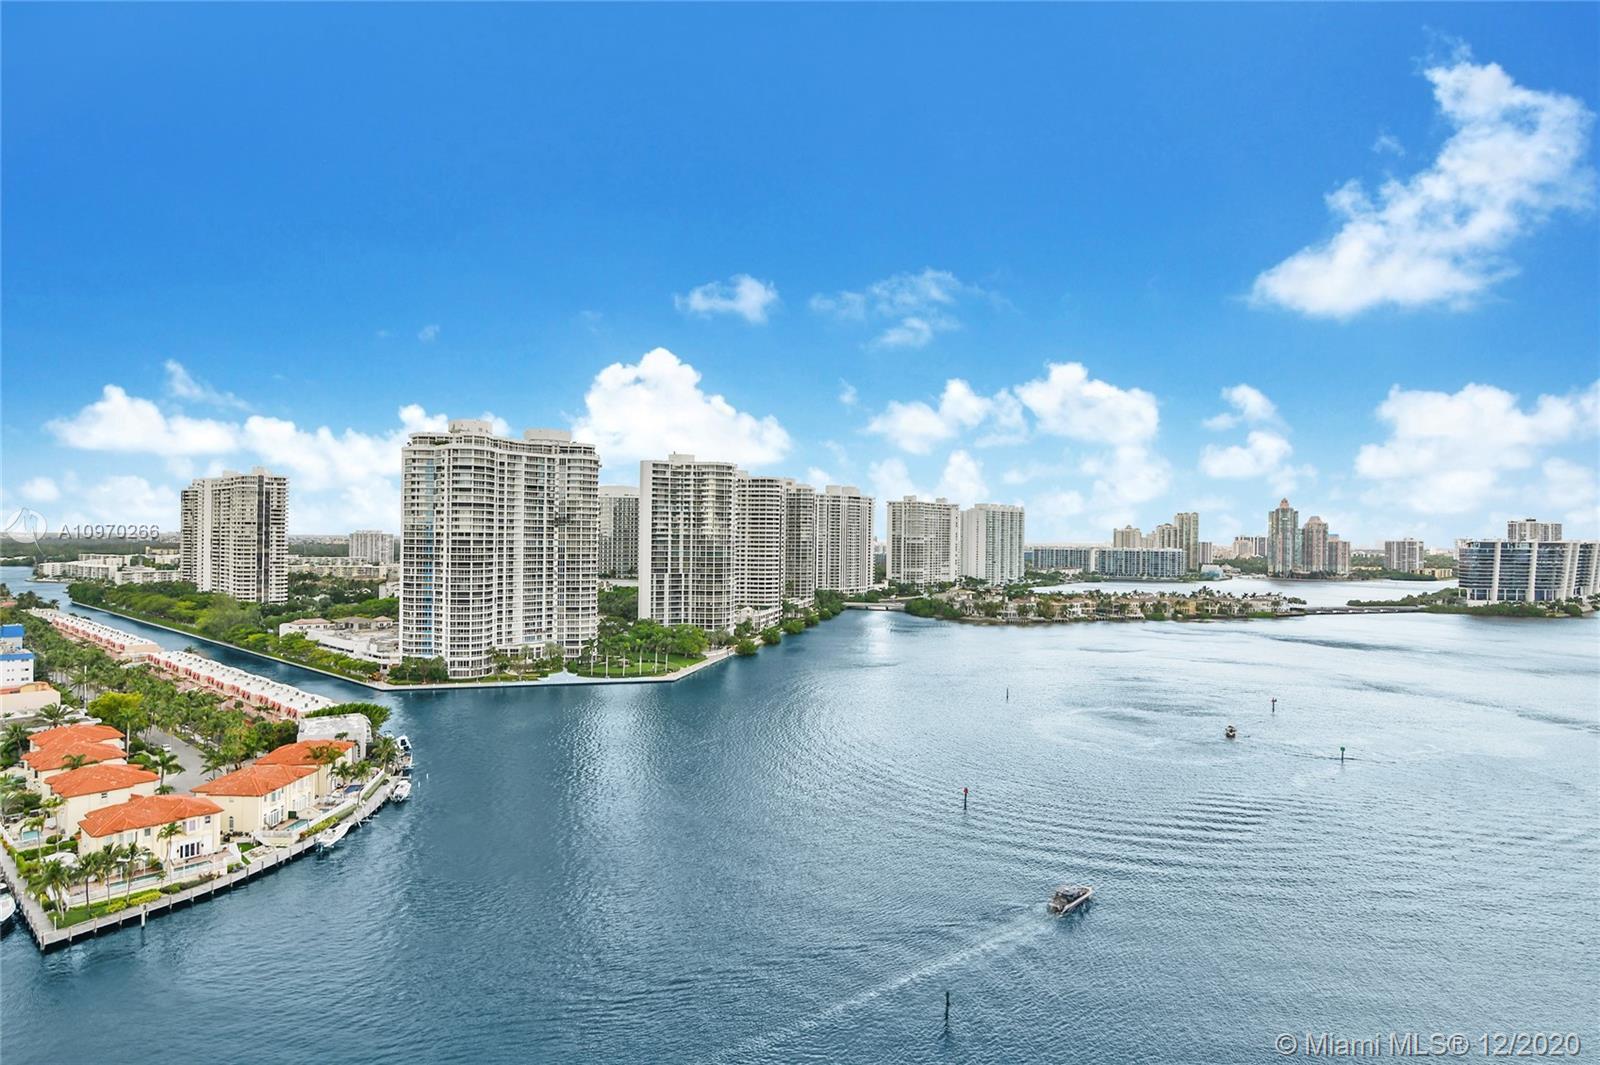 Winston Tower 500 #2301 - 301 174th St #2301, Sunny Isles Beach, FL 33160